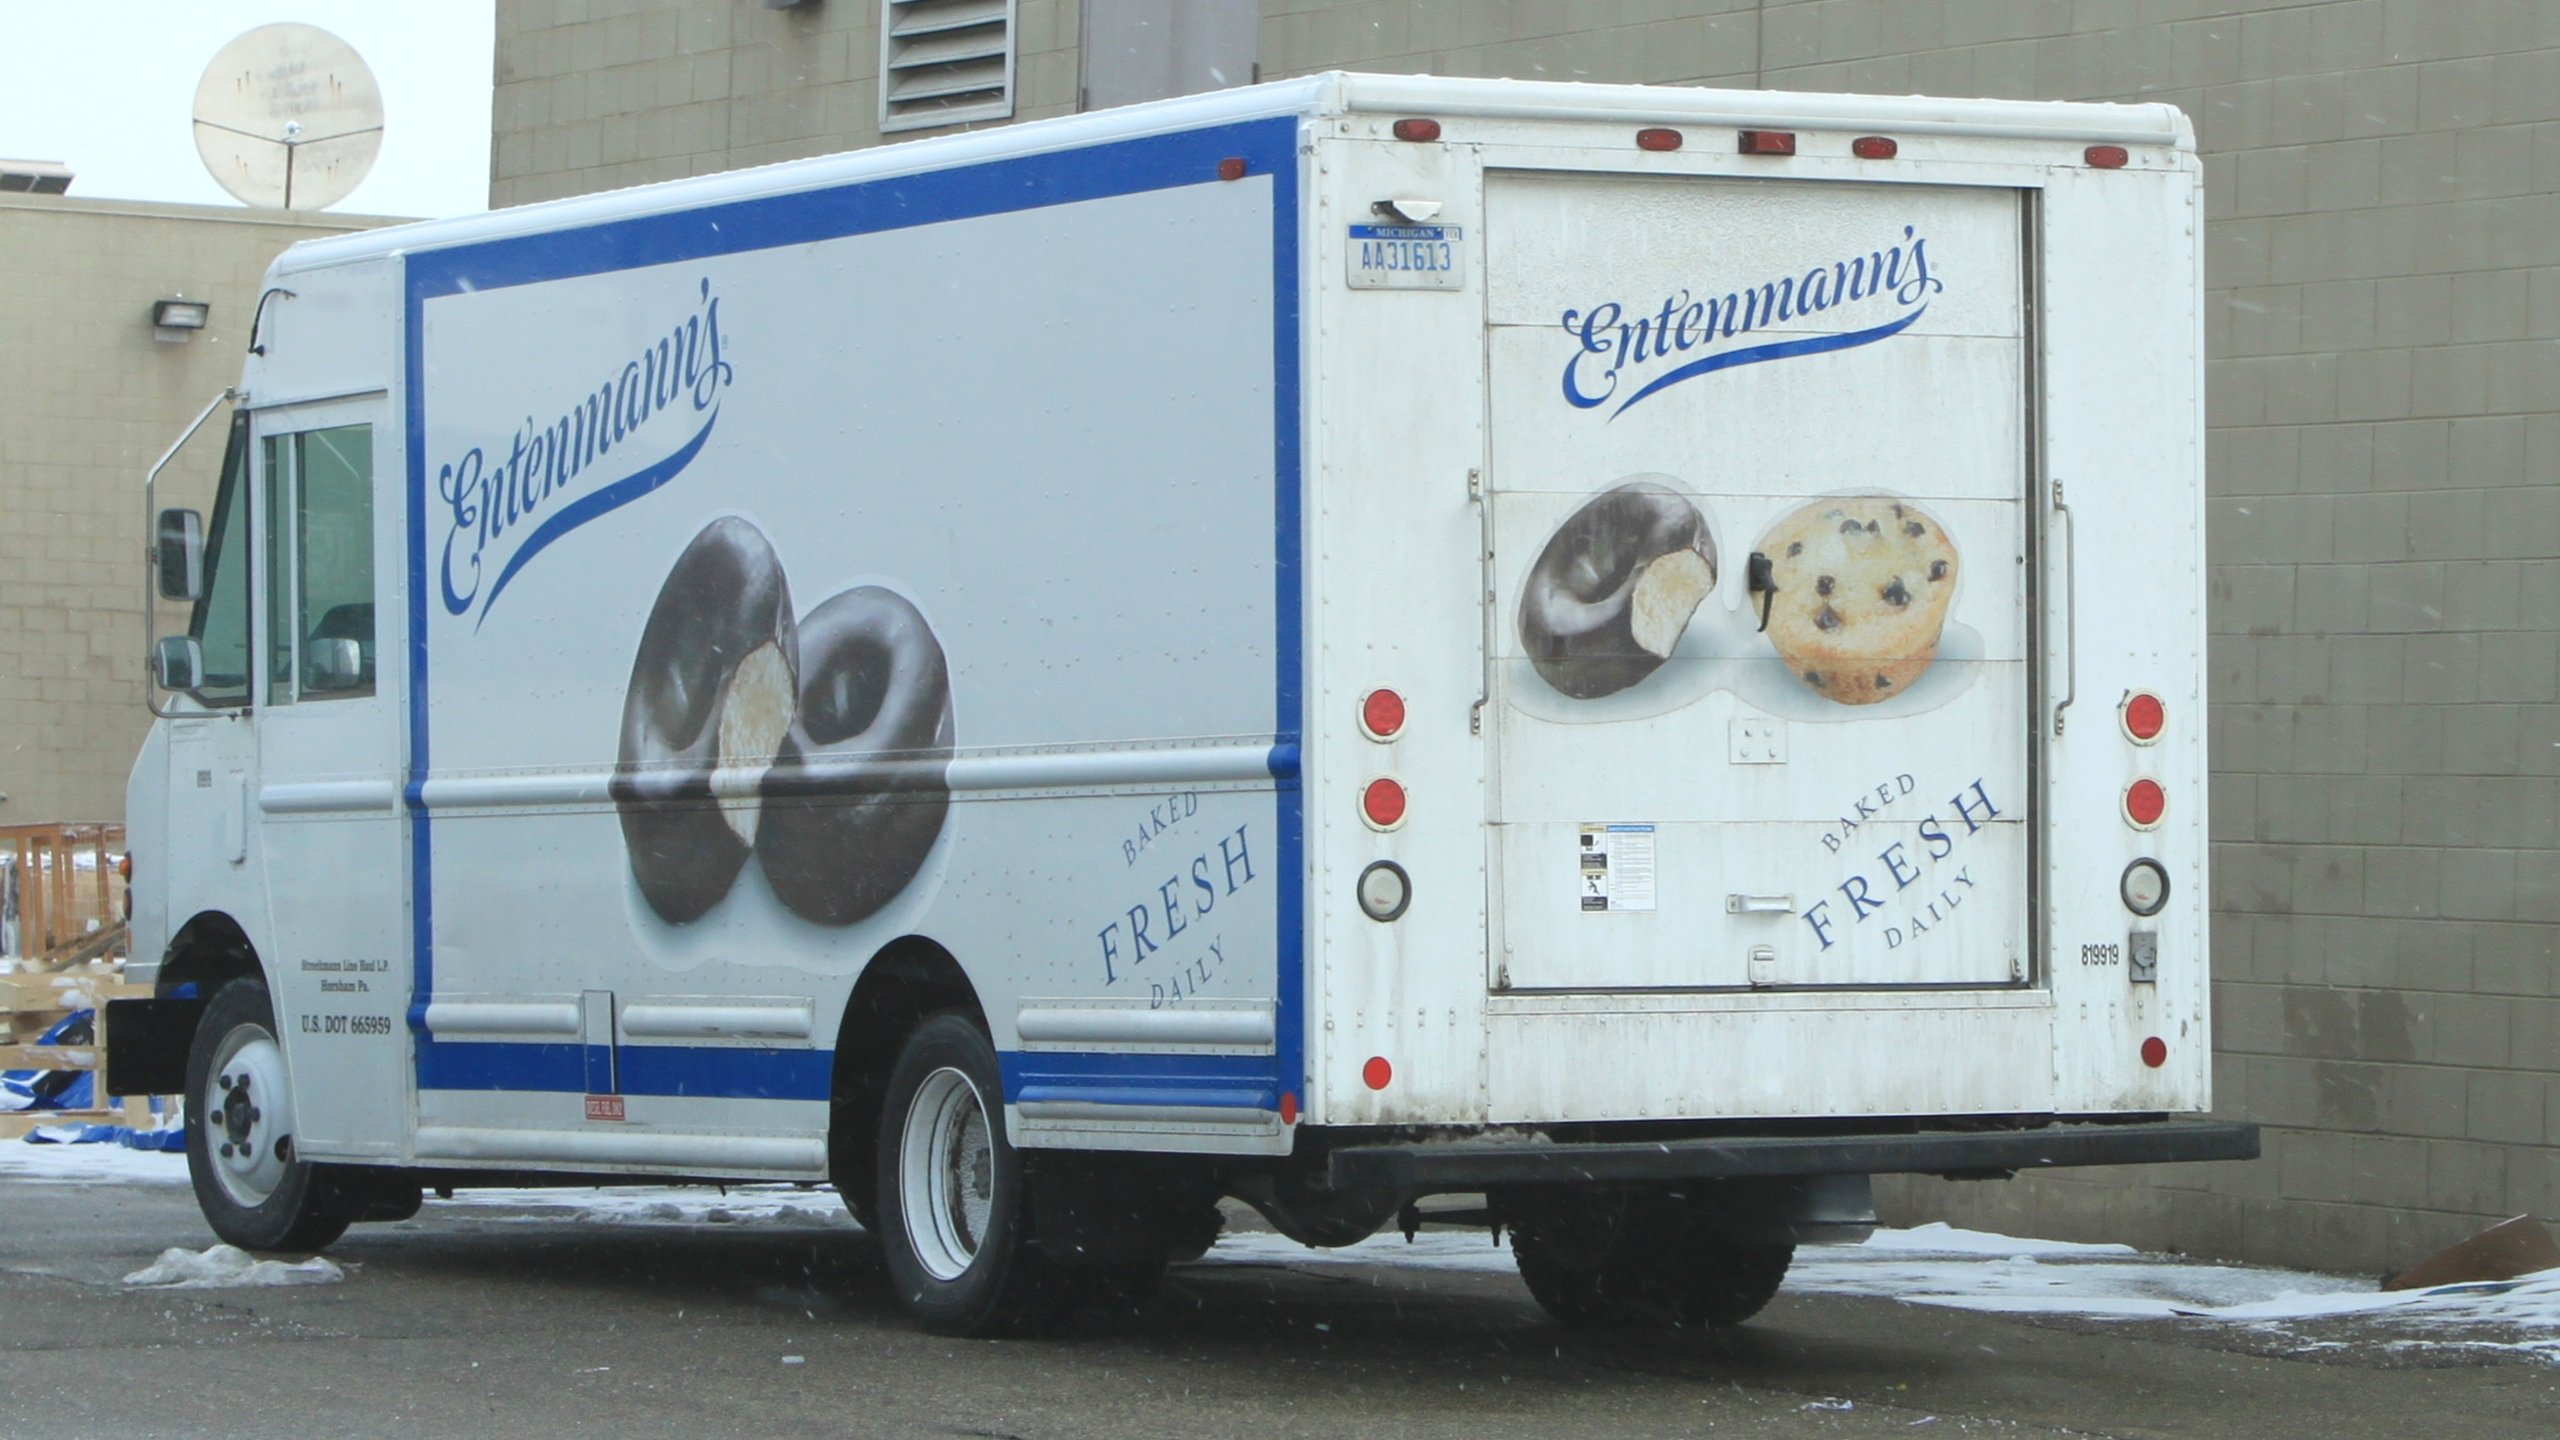 Entenmann's_Delivery_Truck_Ypsilanti_Michigan_190868